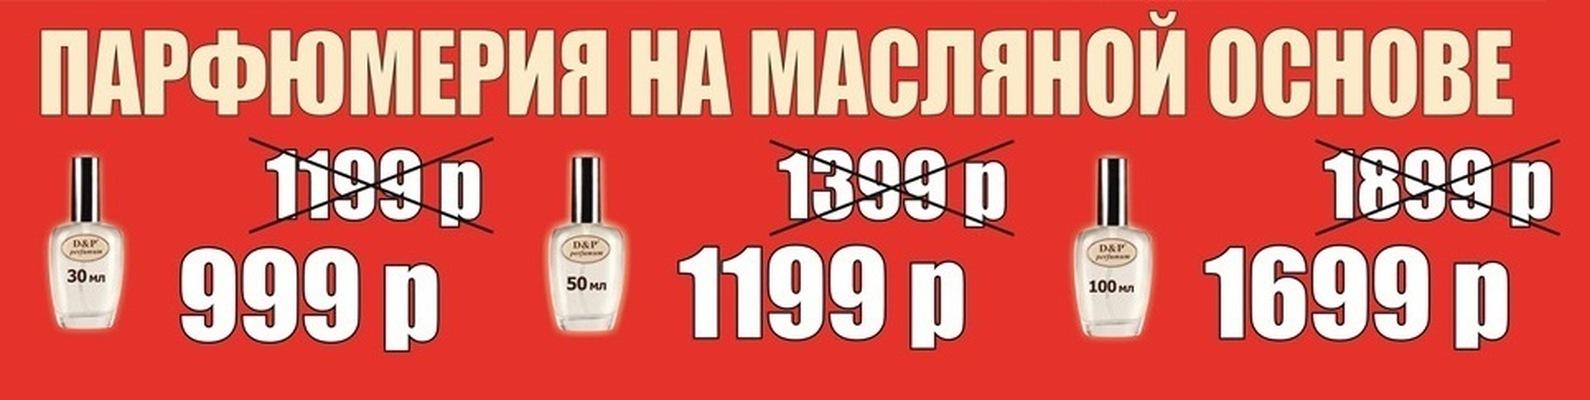 Dp Perfumum масляные духи Dp 8 902 310 08 27 вконтакте